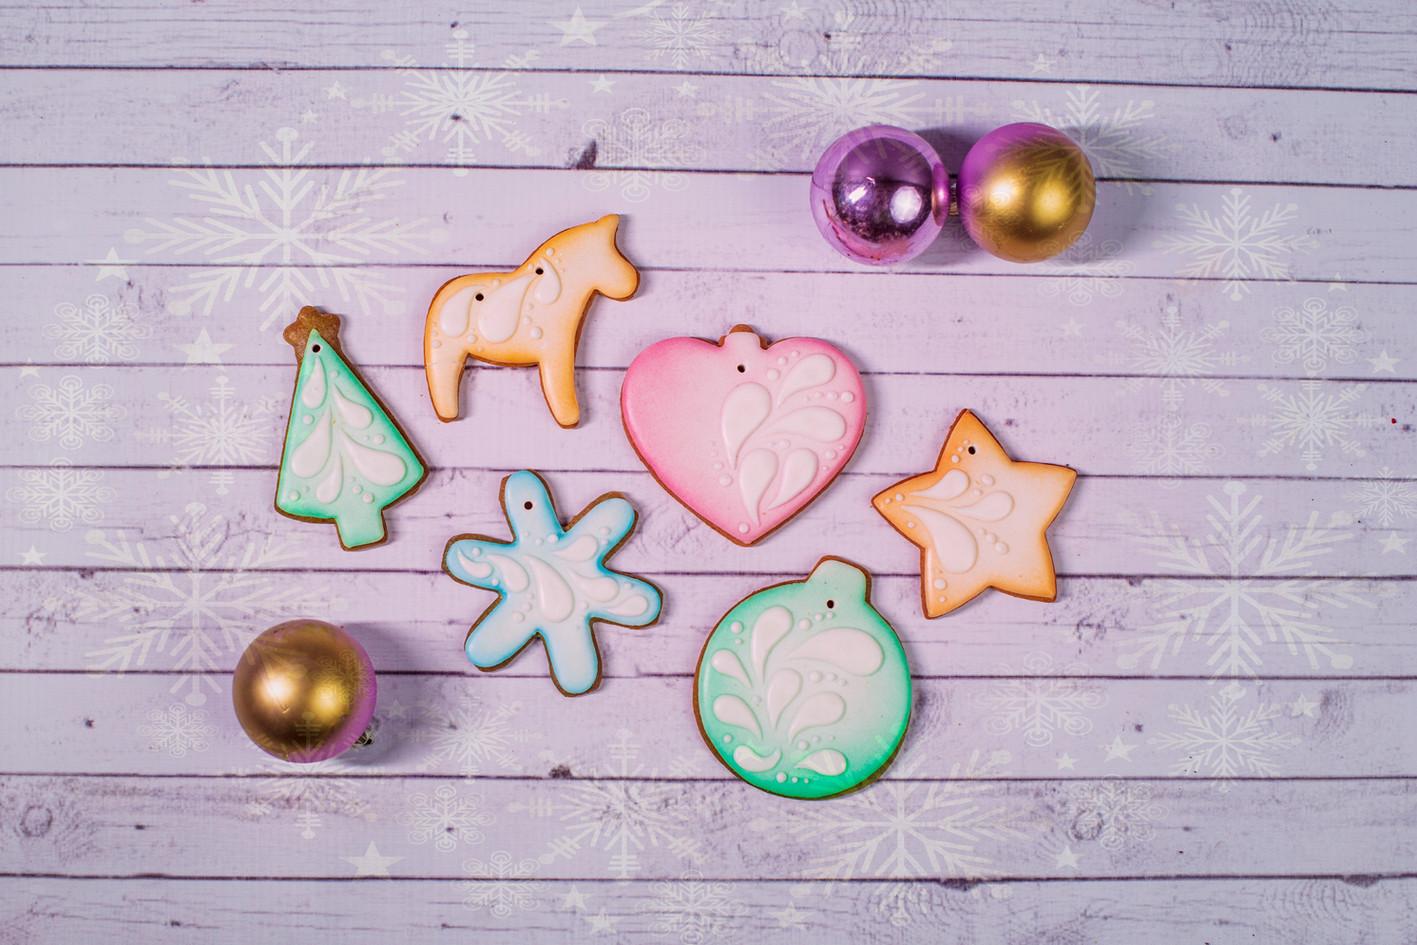 Kolekcja - Świąteczna radość